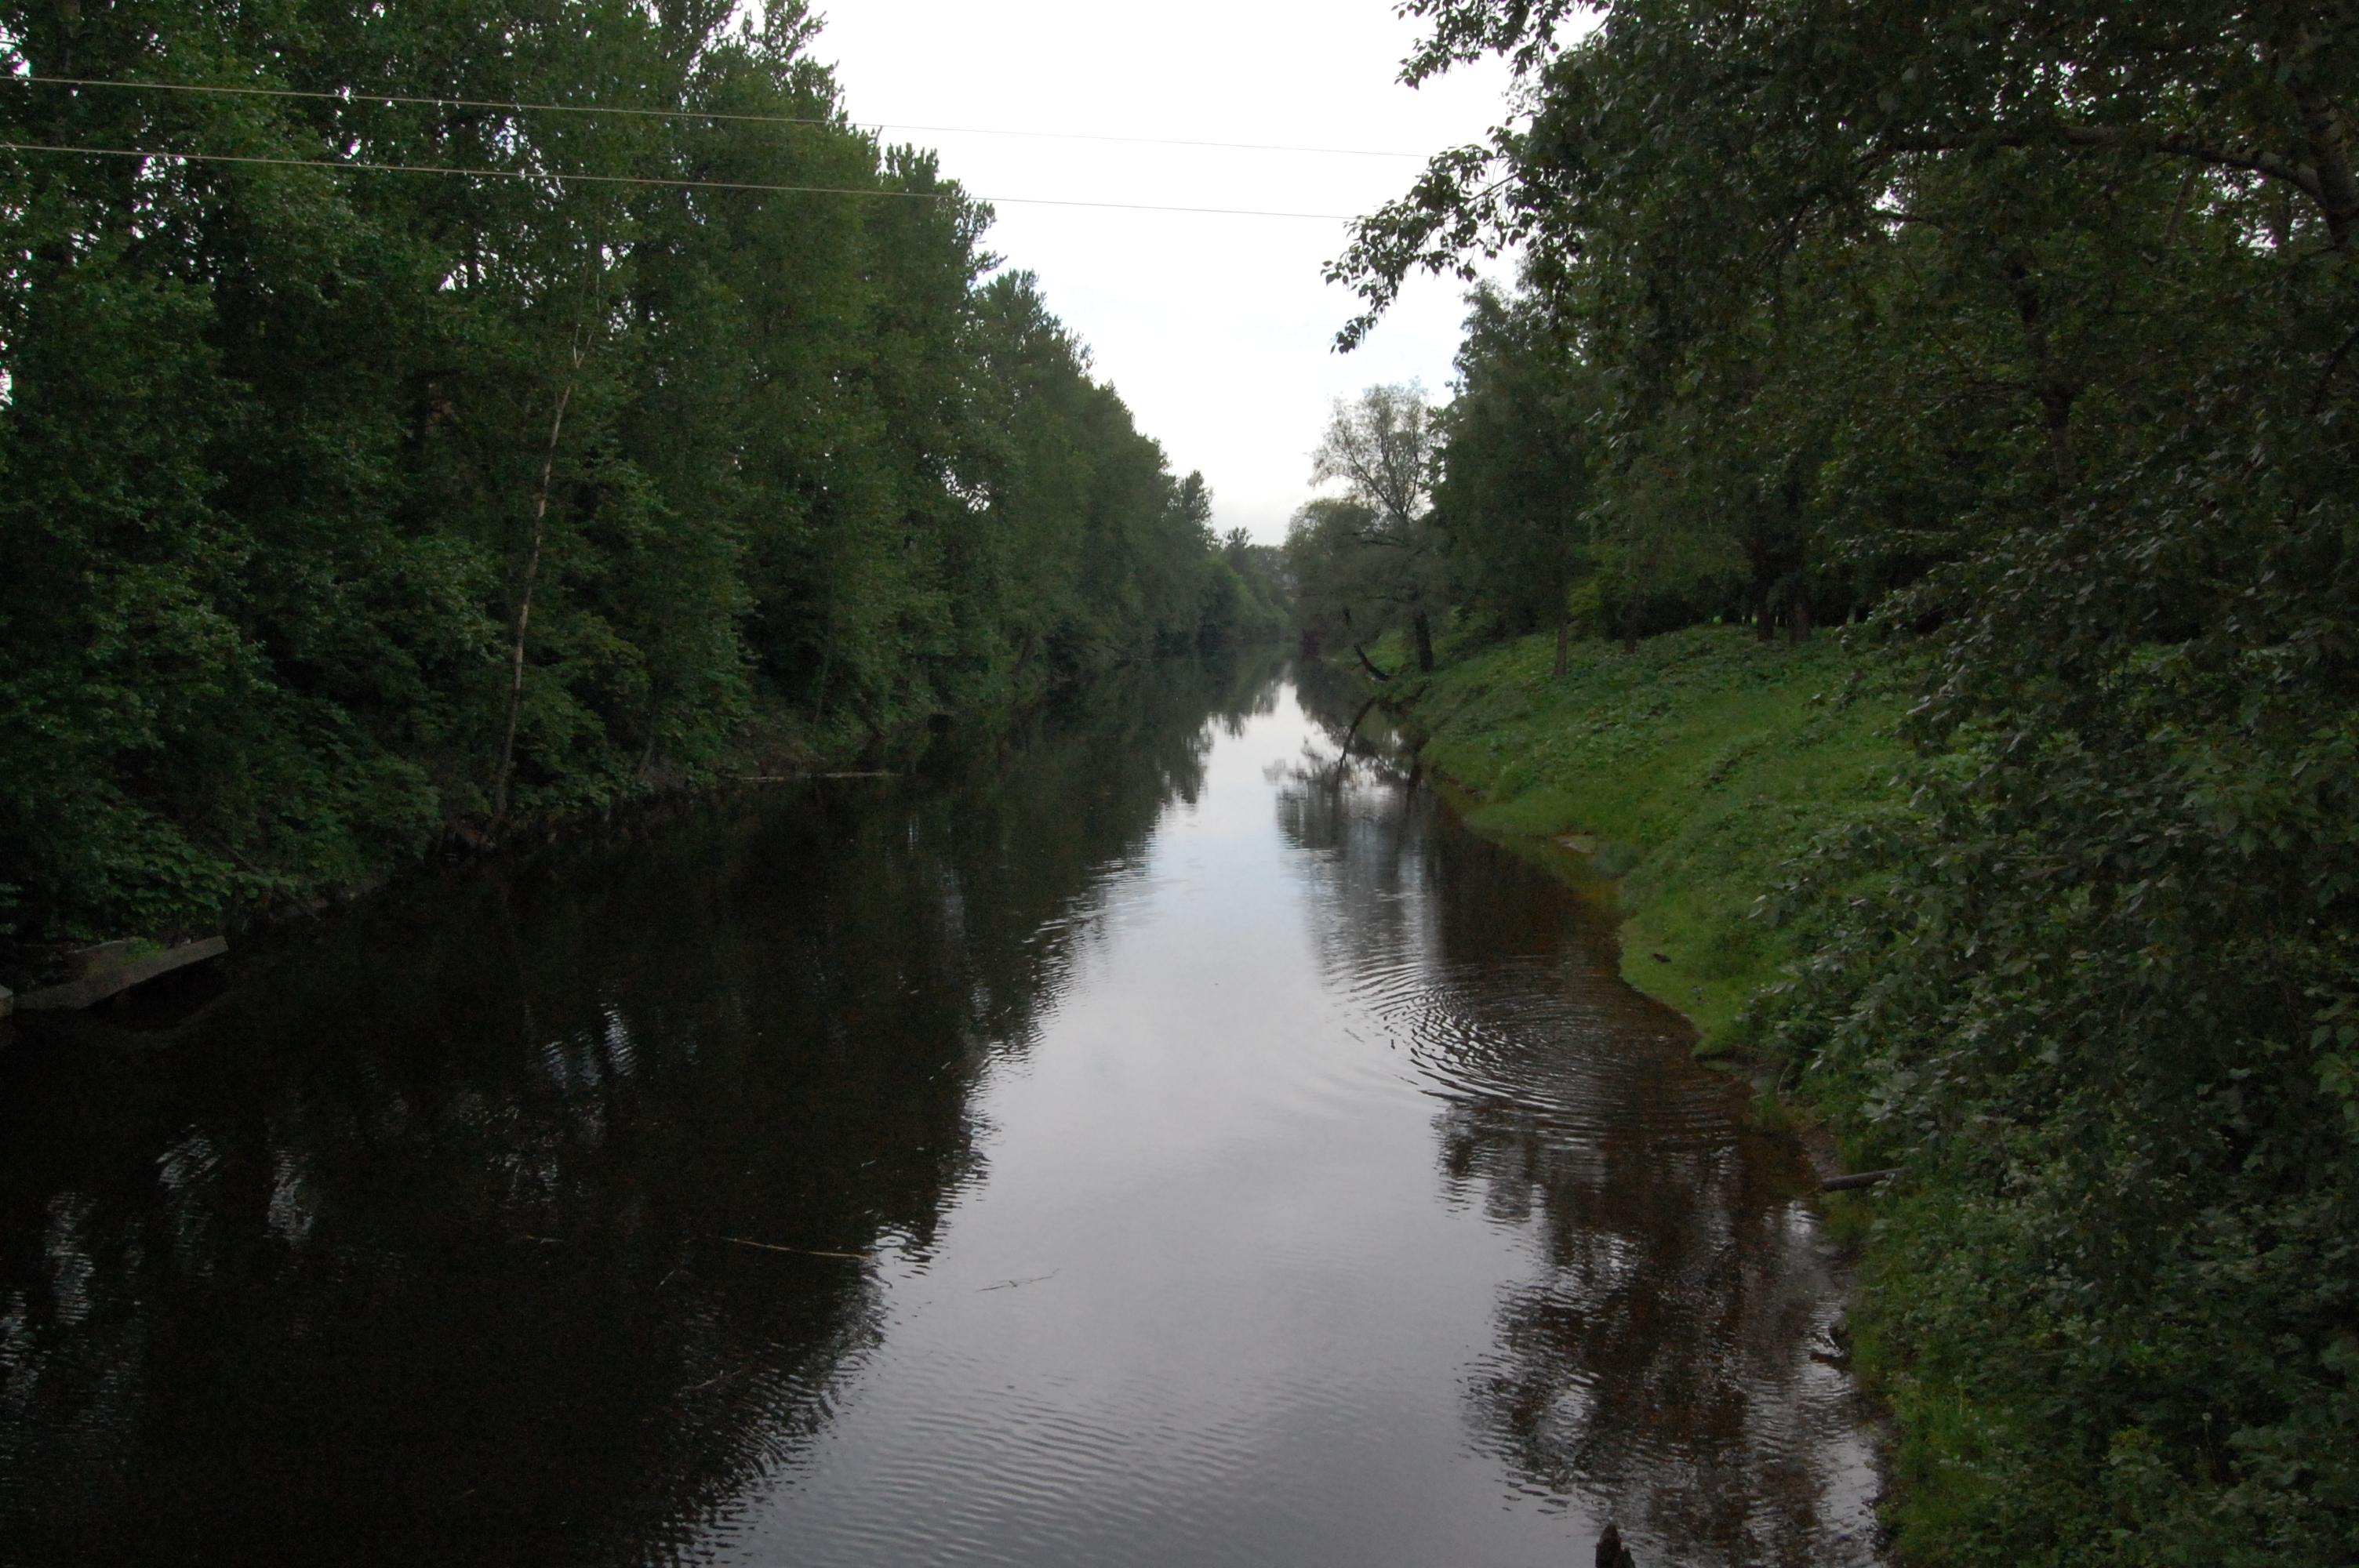 Введенский сад санкт-петербург фото